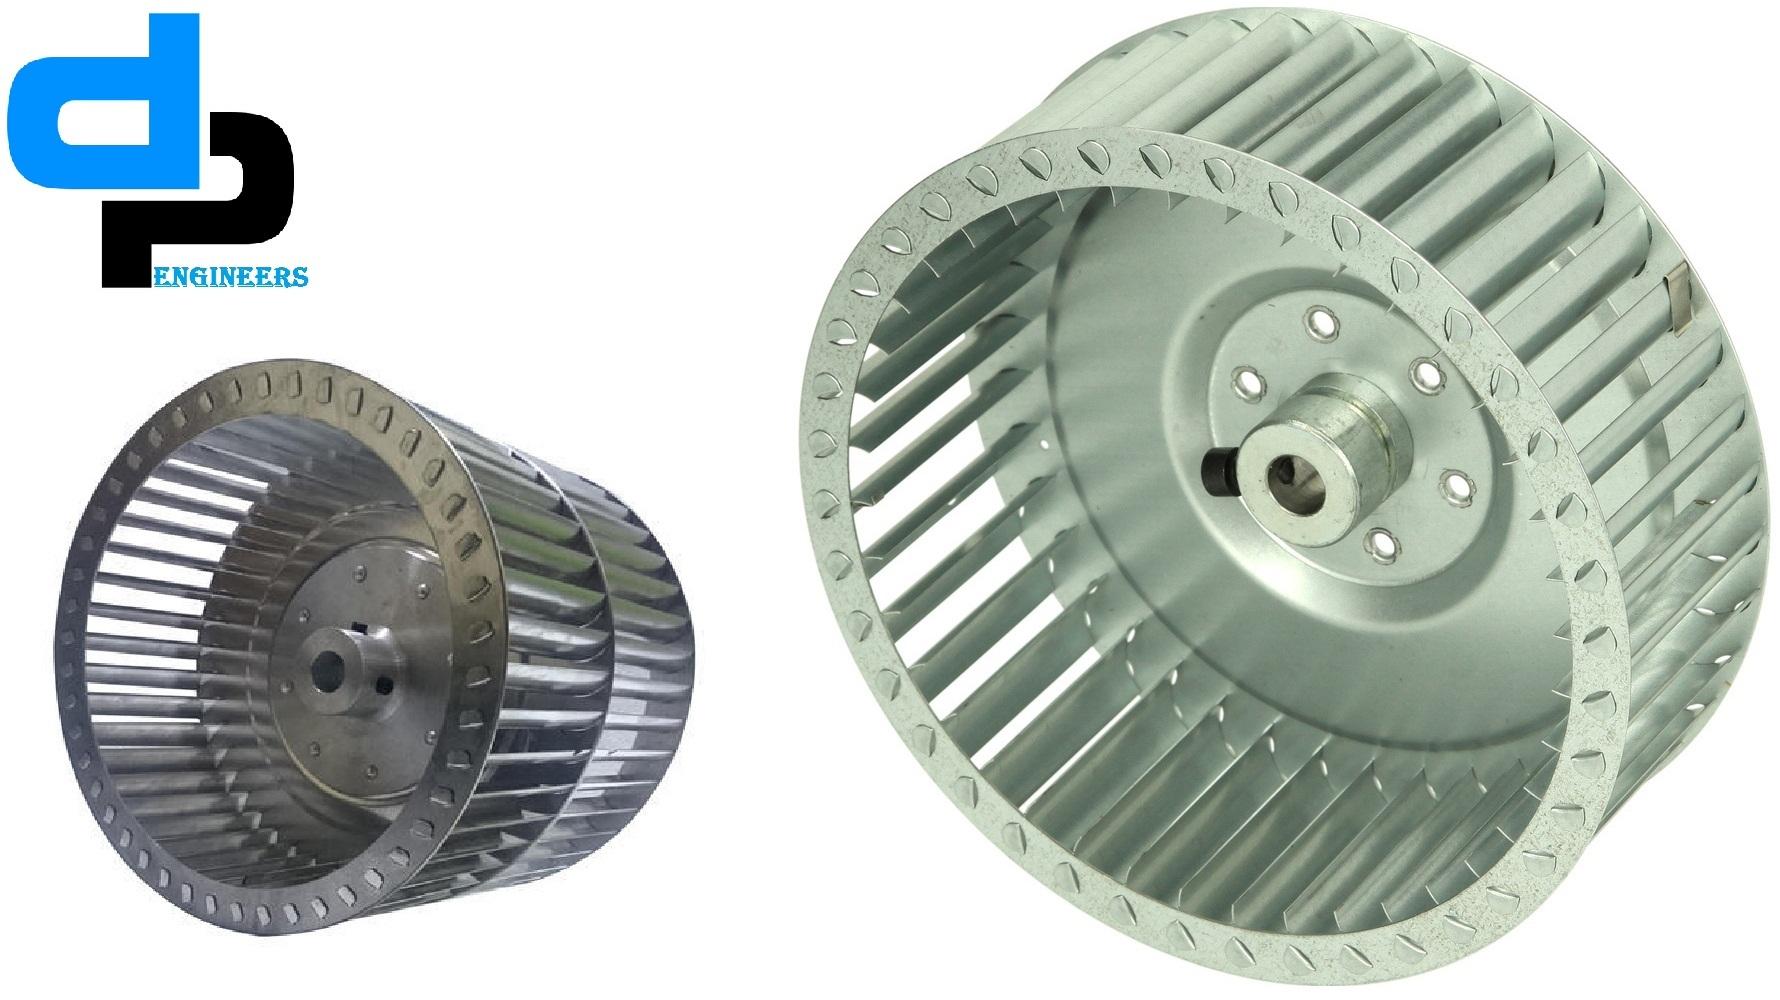 SISW Centrifugal Blower 230 MM X 75 MM